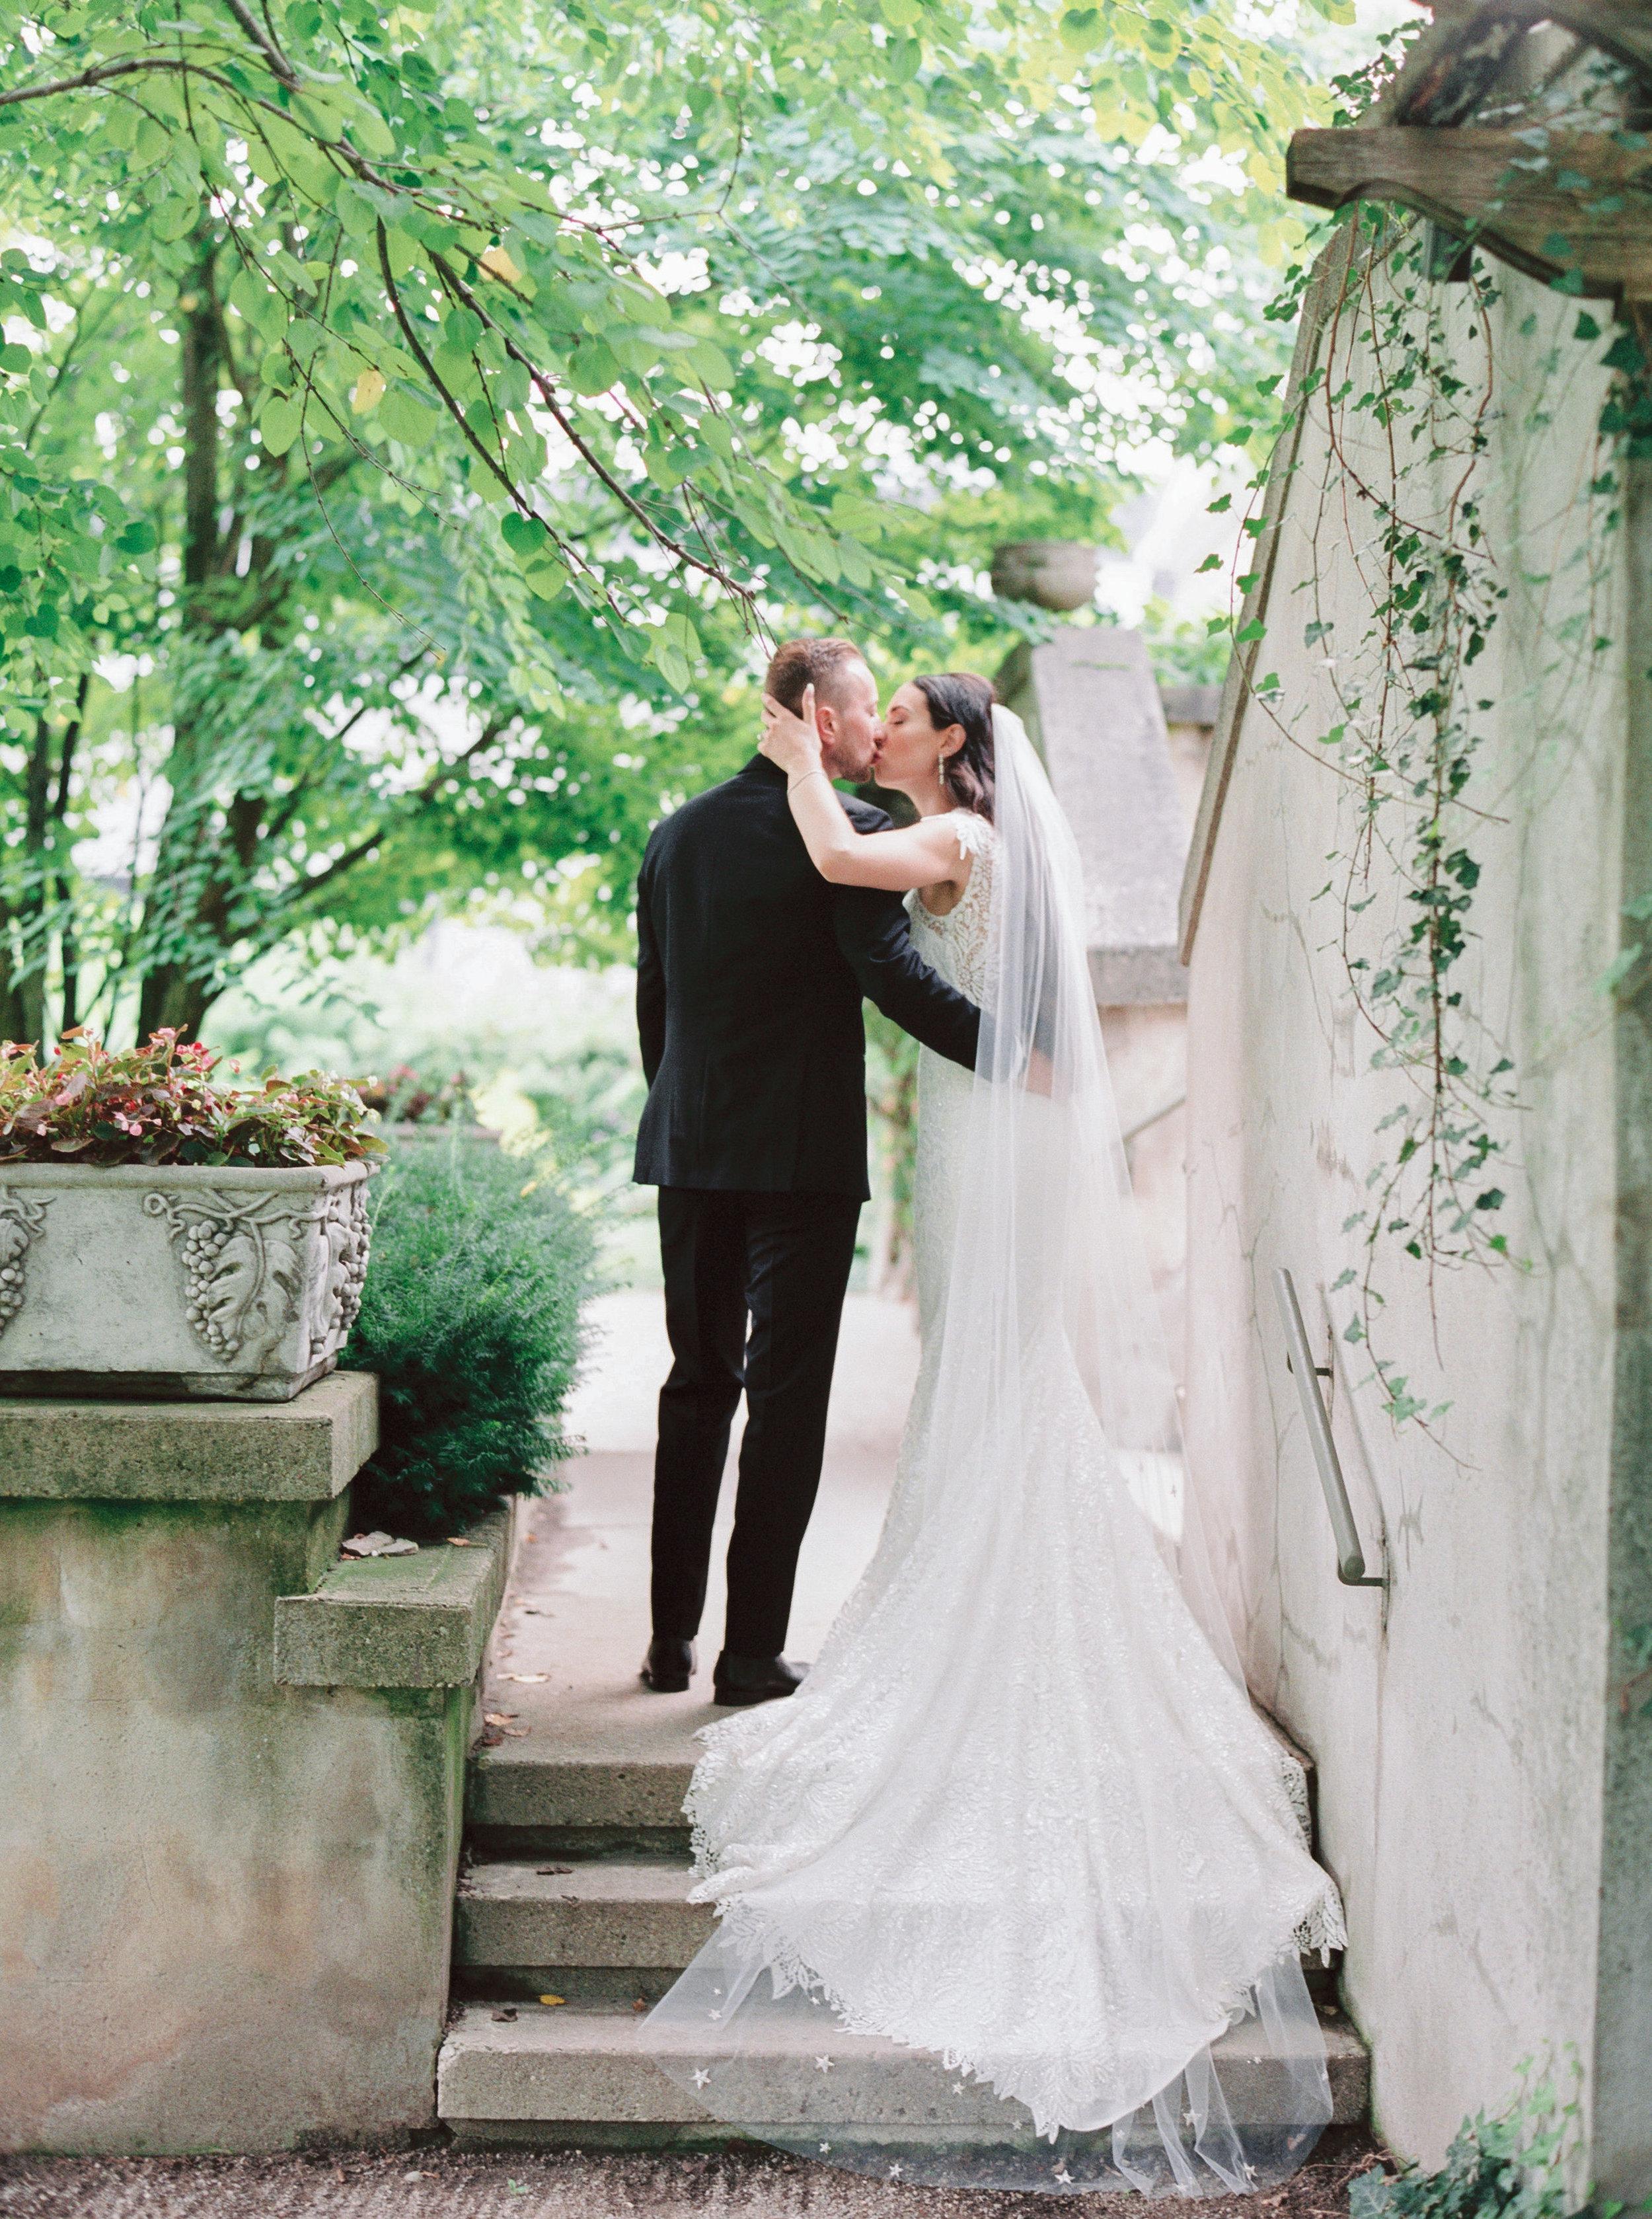 langdon-hall-wedding-toronto-photographer-soft-airy-kurtz-bre-tom-firshade-787.jpg